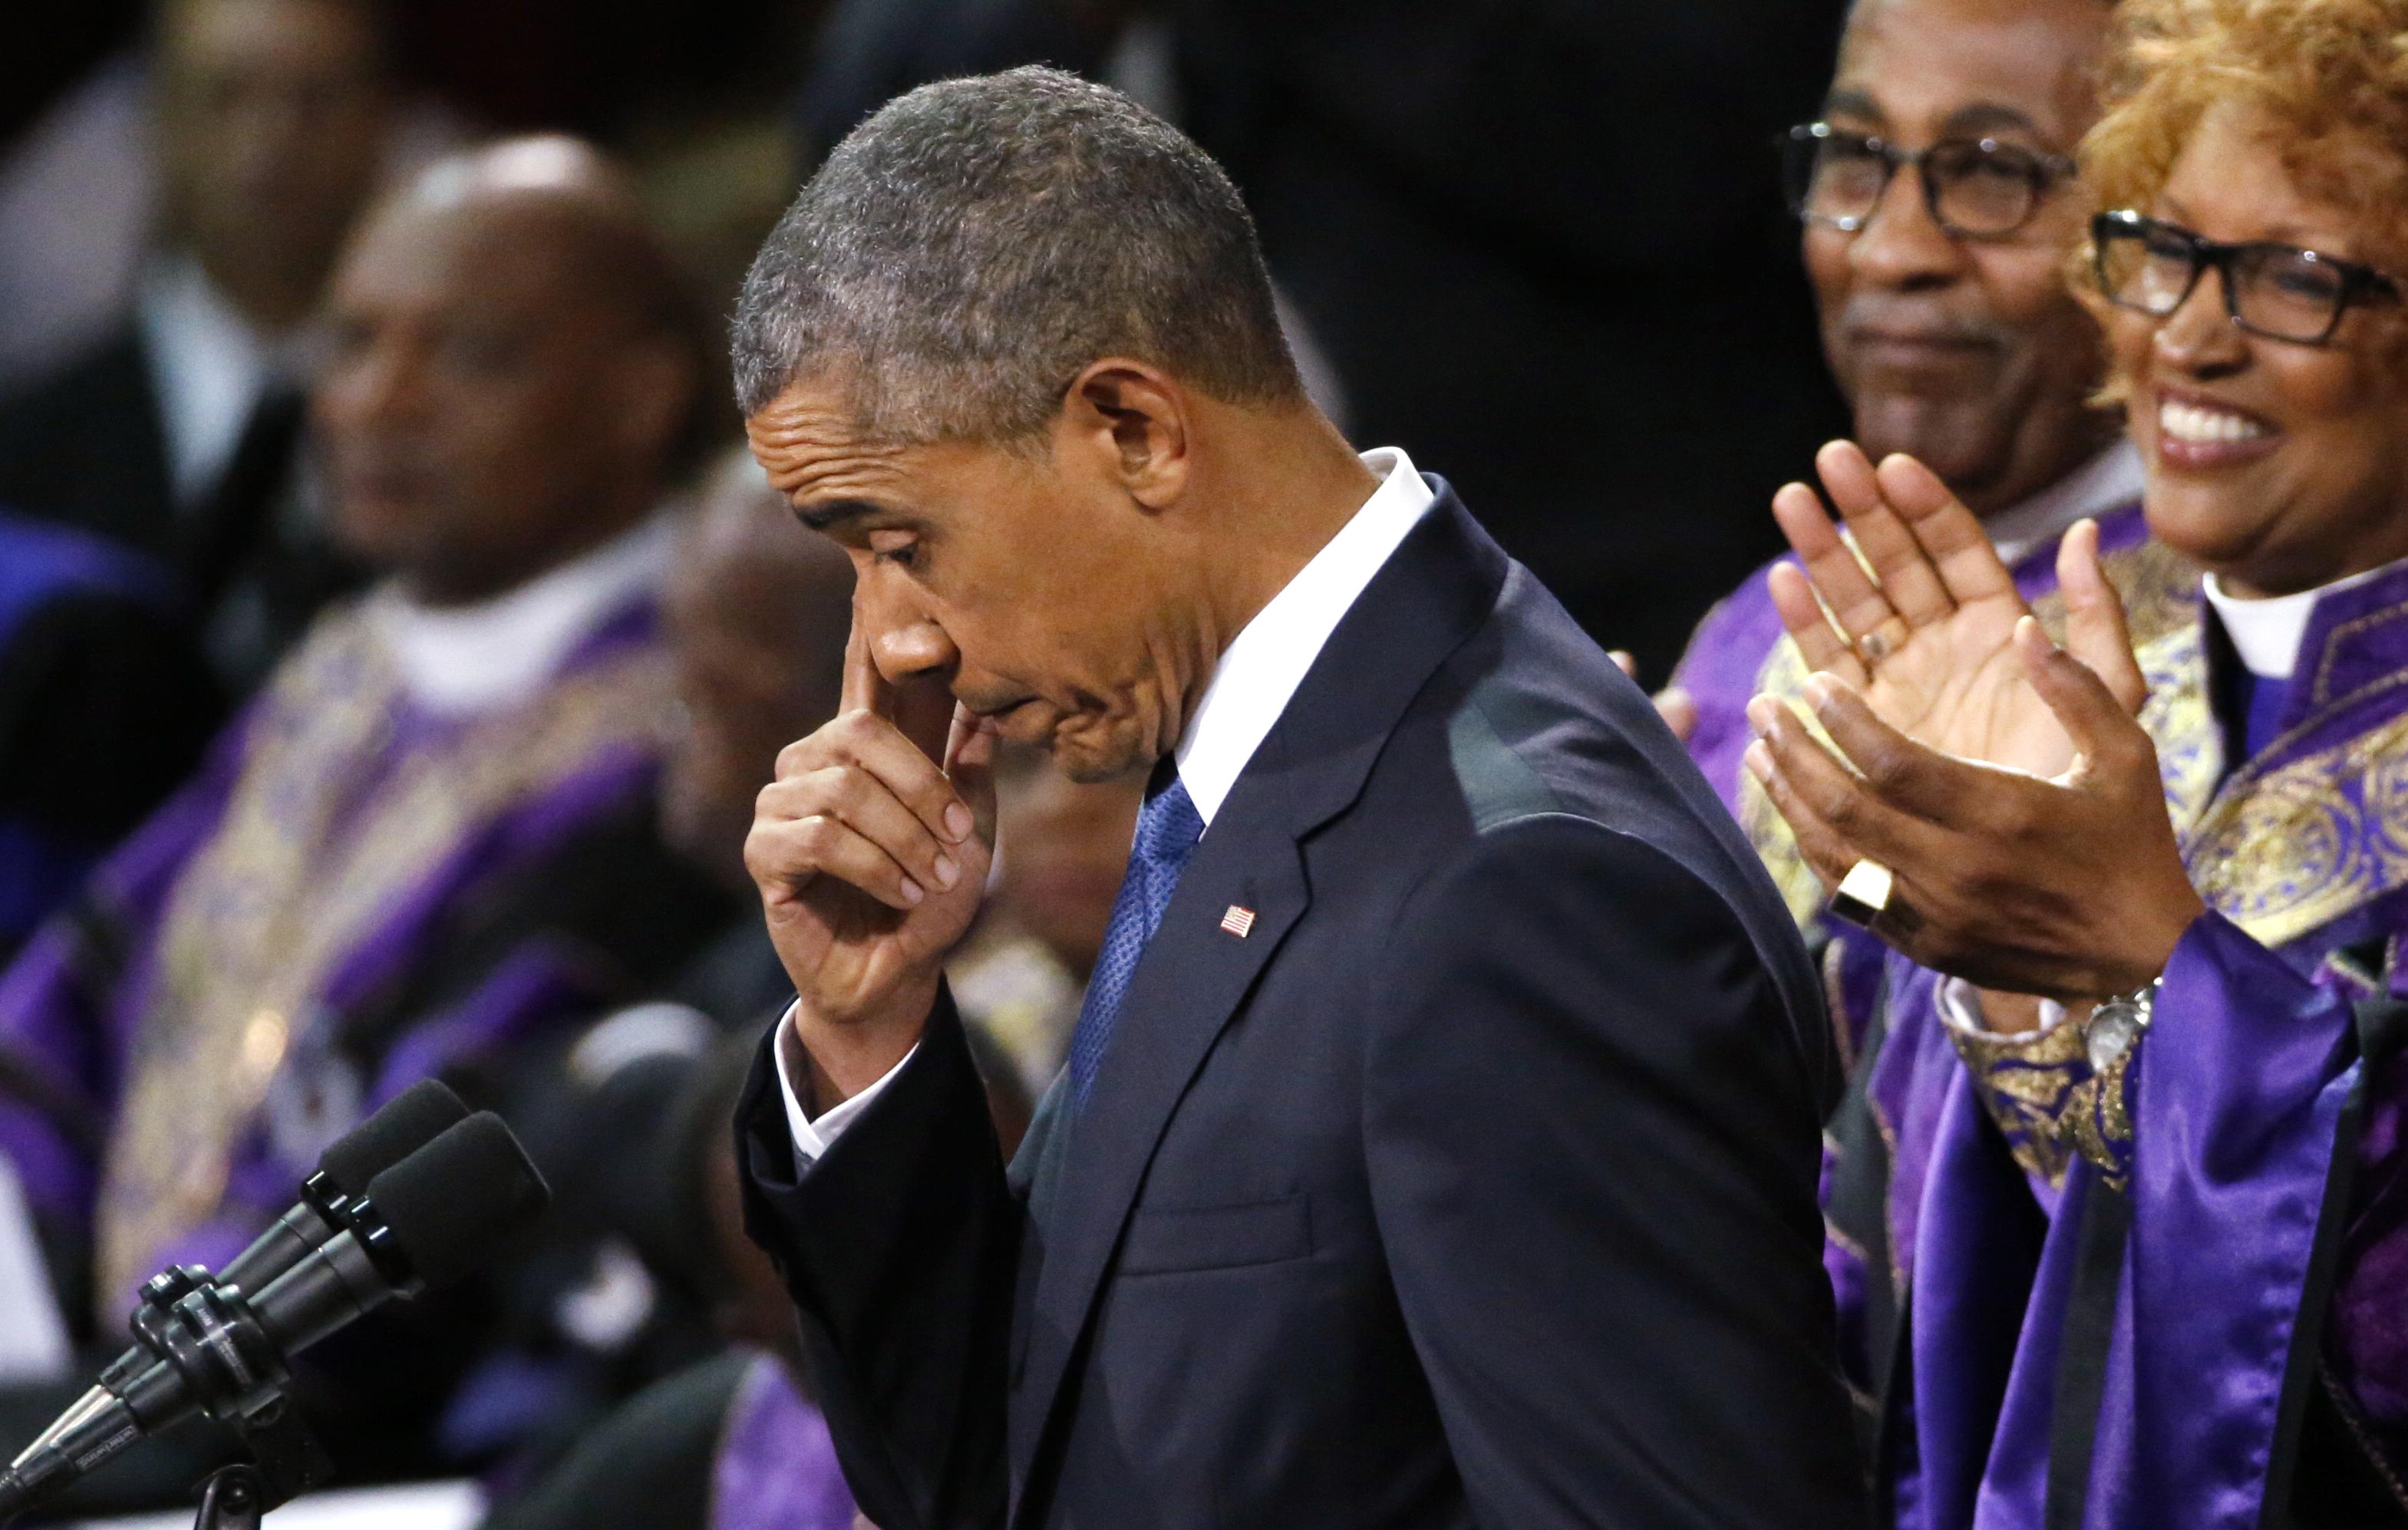 African American History, African American Politics, President Barack Obama, Barack Obama, Ta-Nehisi Coates, KOLUMN Magazine, KOLUMN